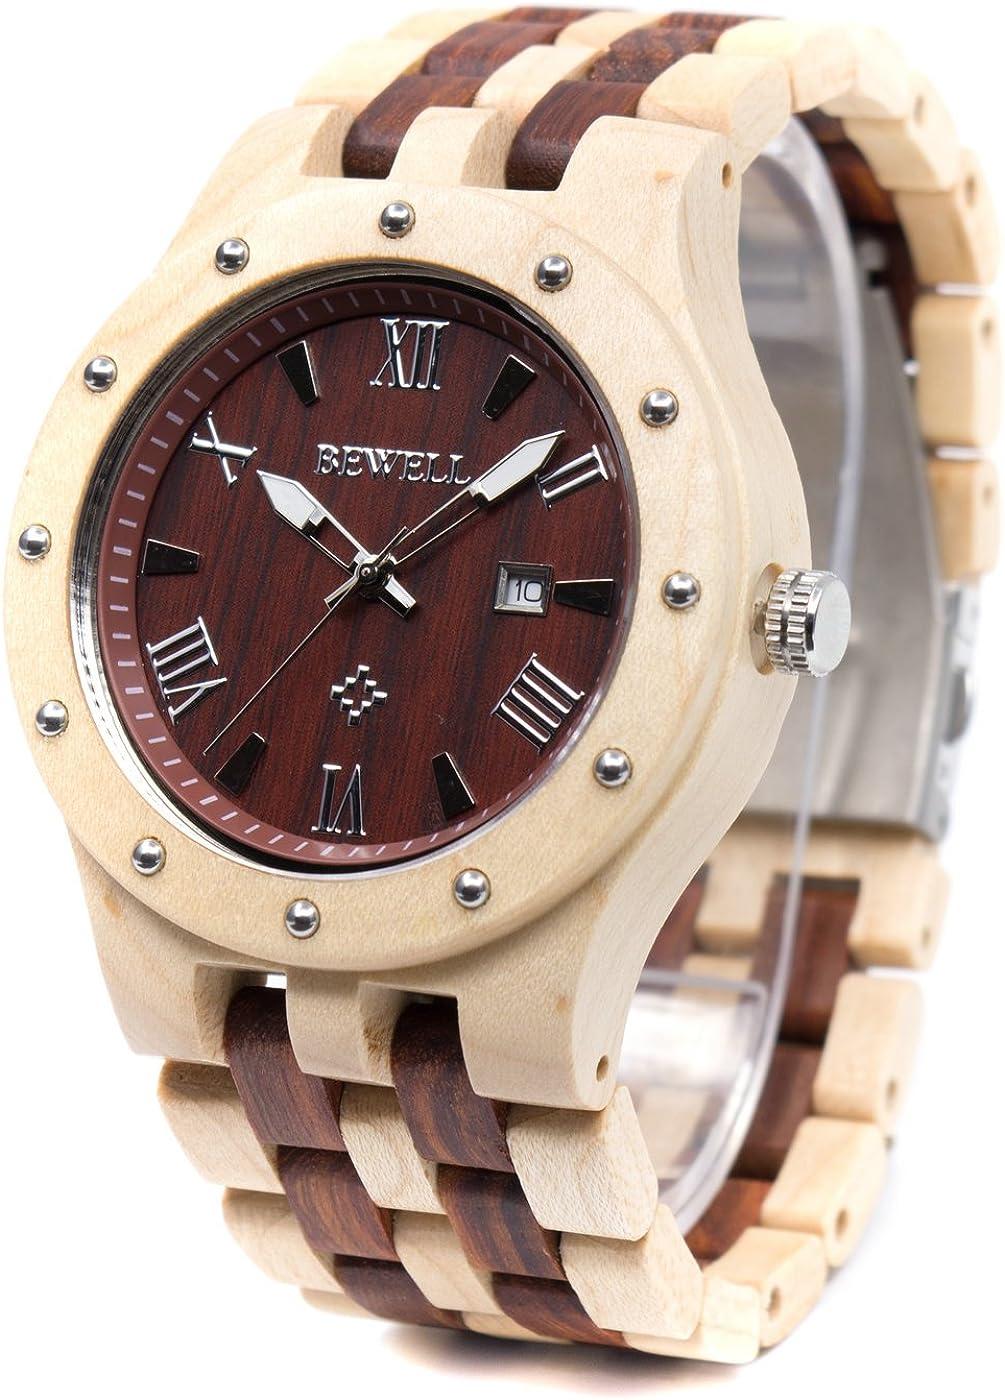 Bewell Men s Wooden Watches Handmade Date Display Analog Quartz Luminous Wristwatch